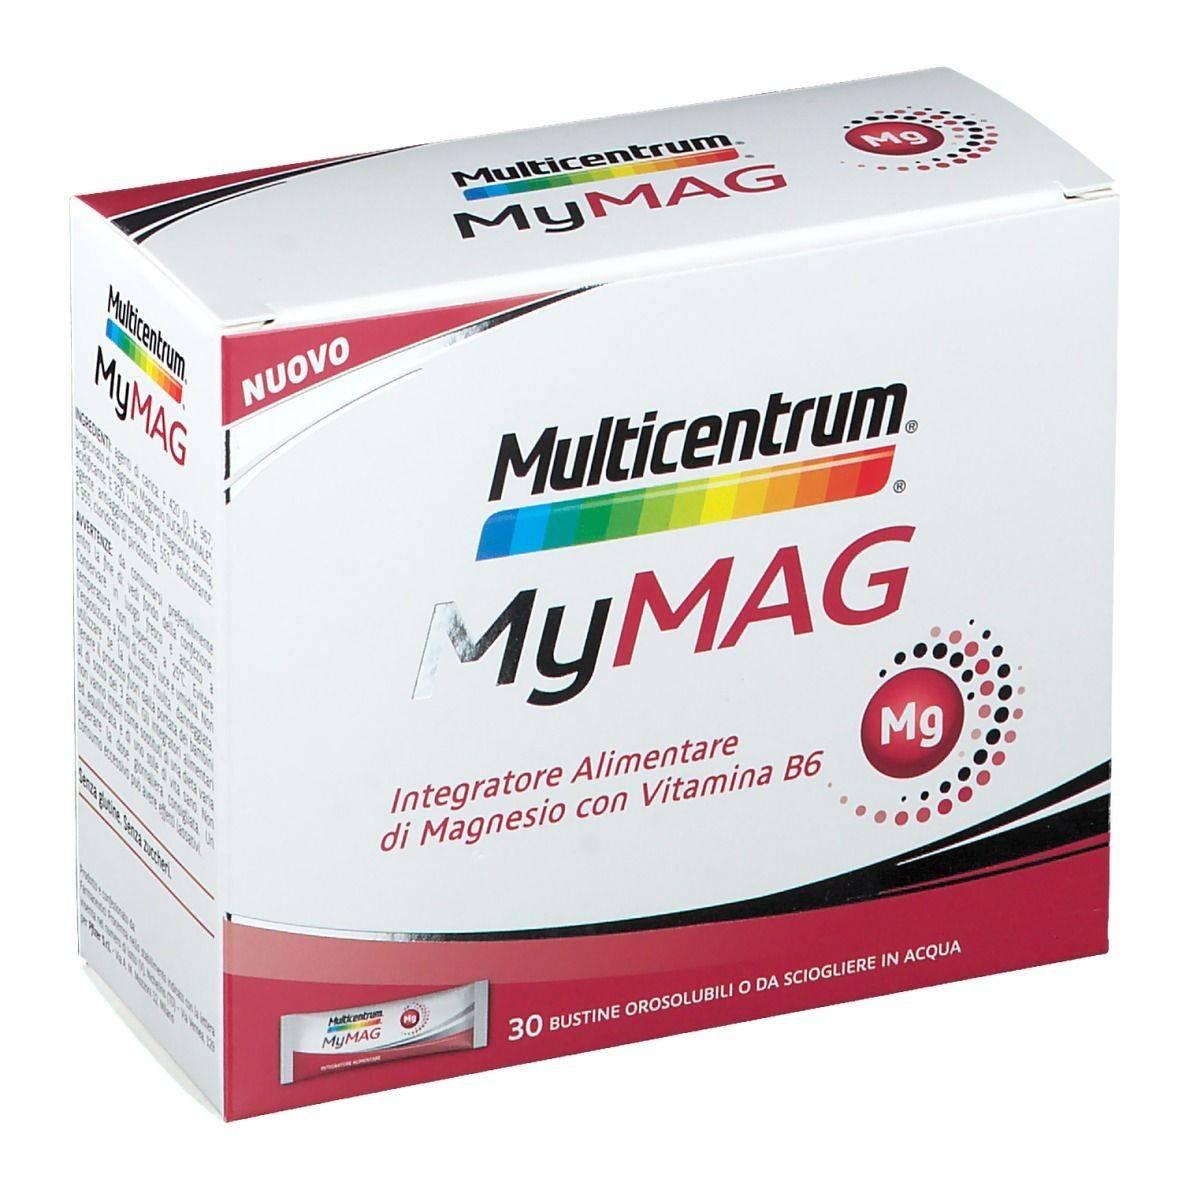 Multicentrum MyMag 30bst